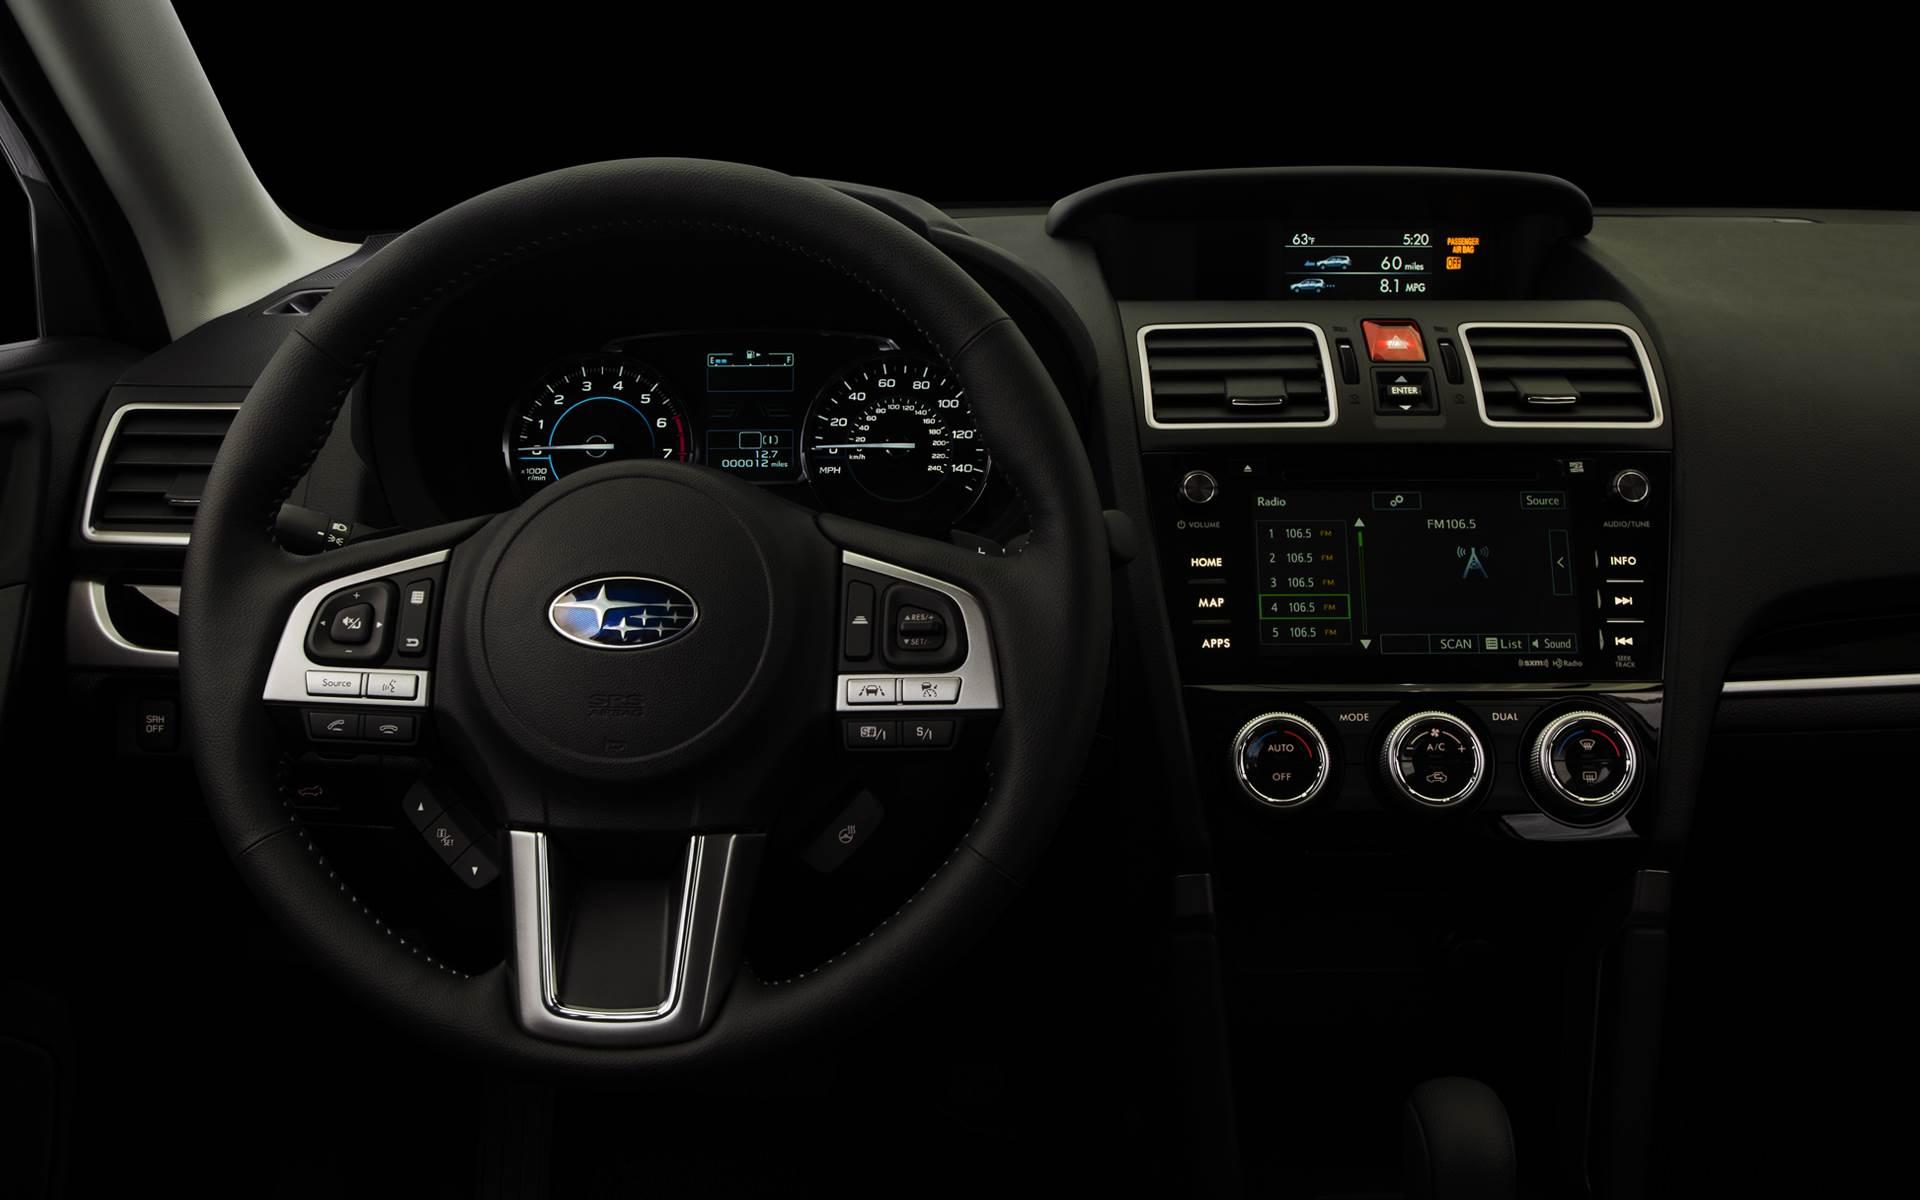 Subaru forester dashboard symbols winner subaru dover de indicator lights vs warning lights biocorpaavc